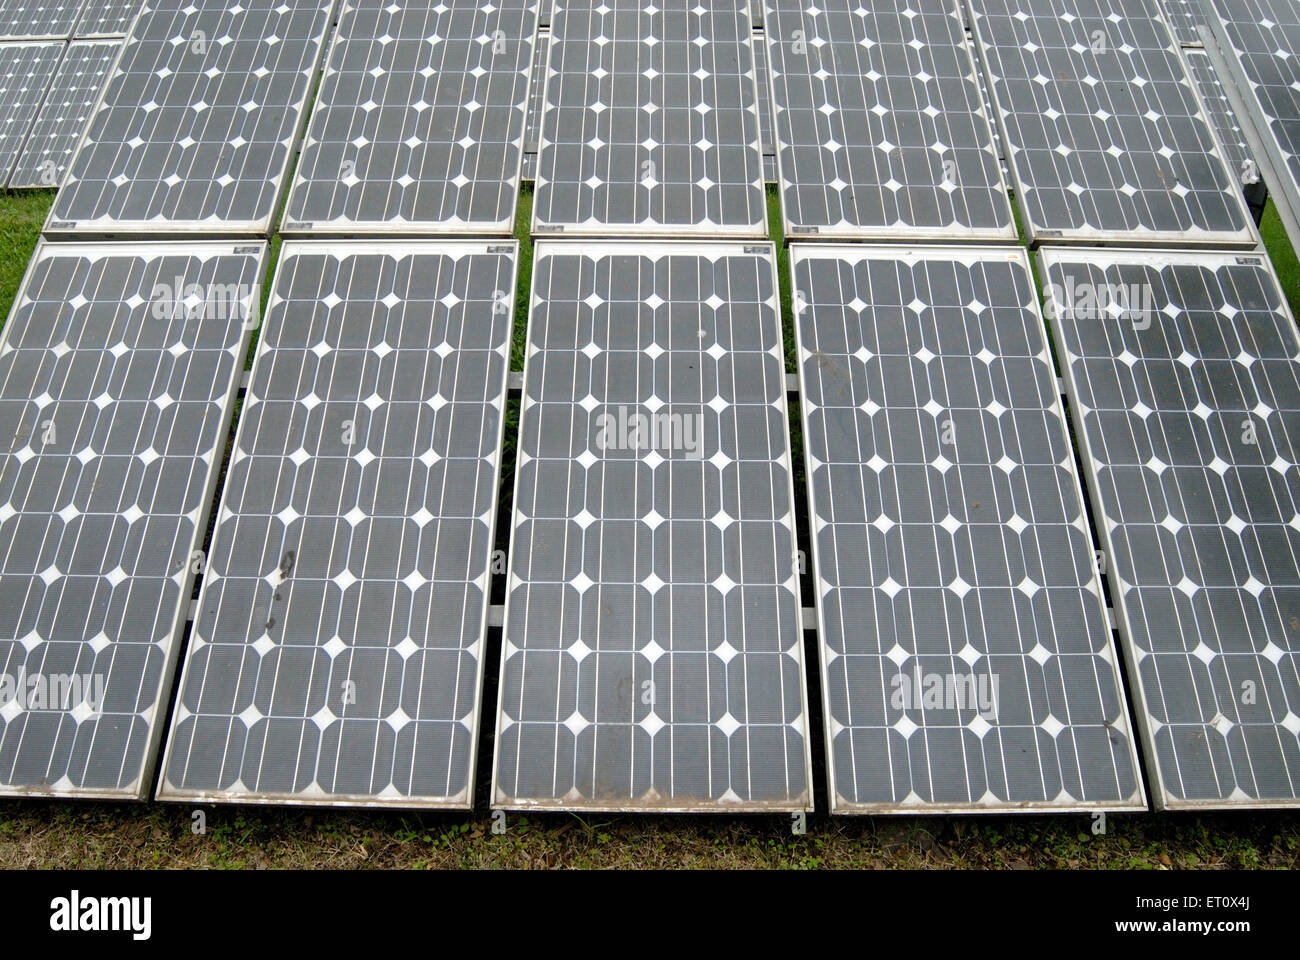 Unkonventionelle macht; Solarenergie; Photovoltaik-Zellen im Energiepark Peshawe; Pune; Maharashtra; Indien Stockbild